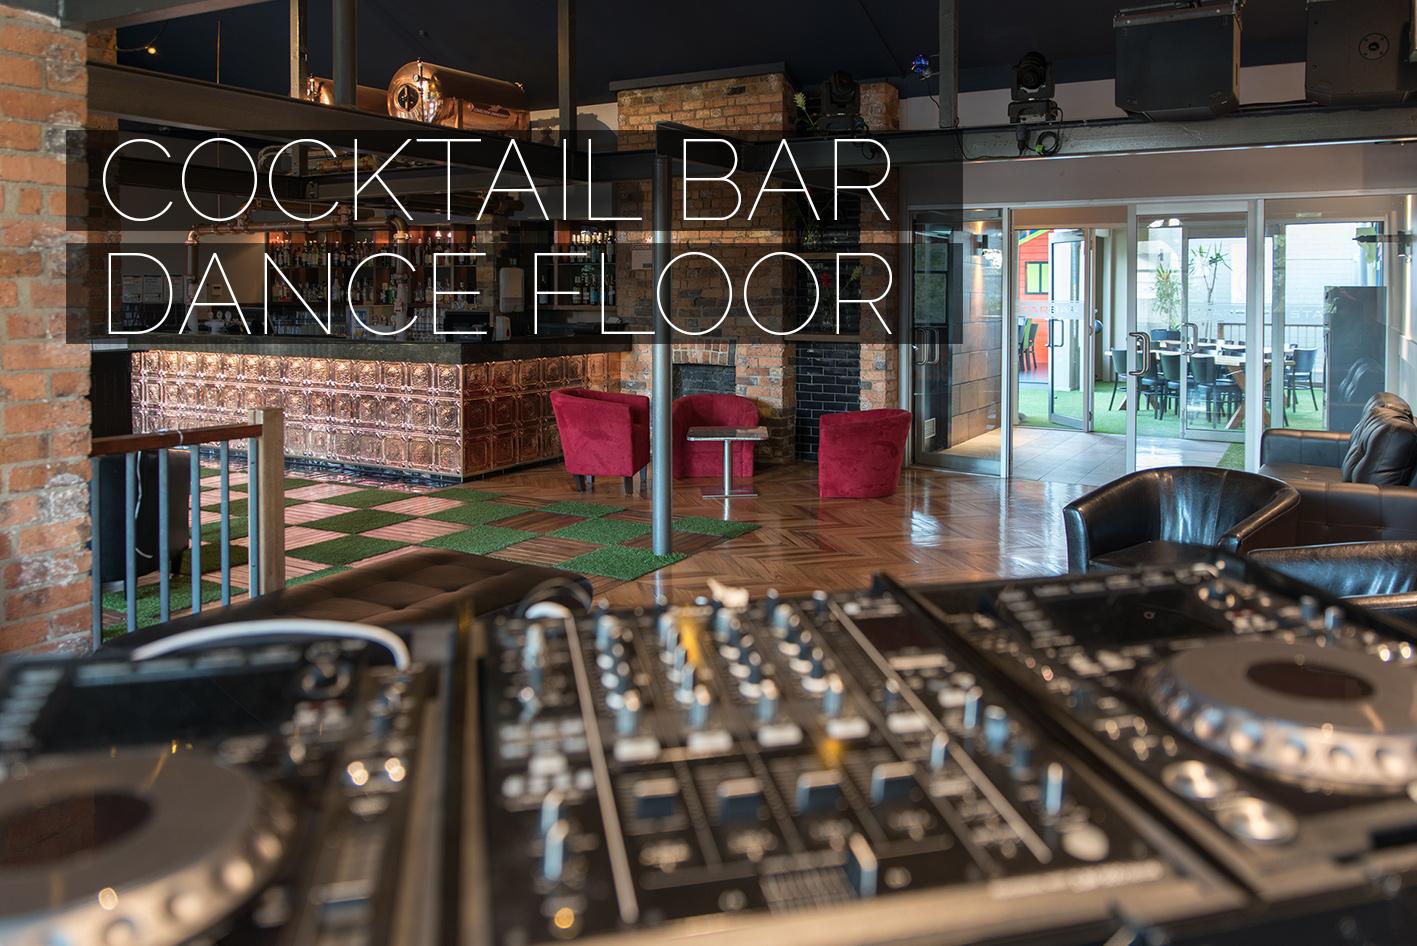 10.-Cocktail-Dance-Floor.jpg